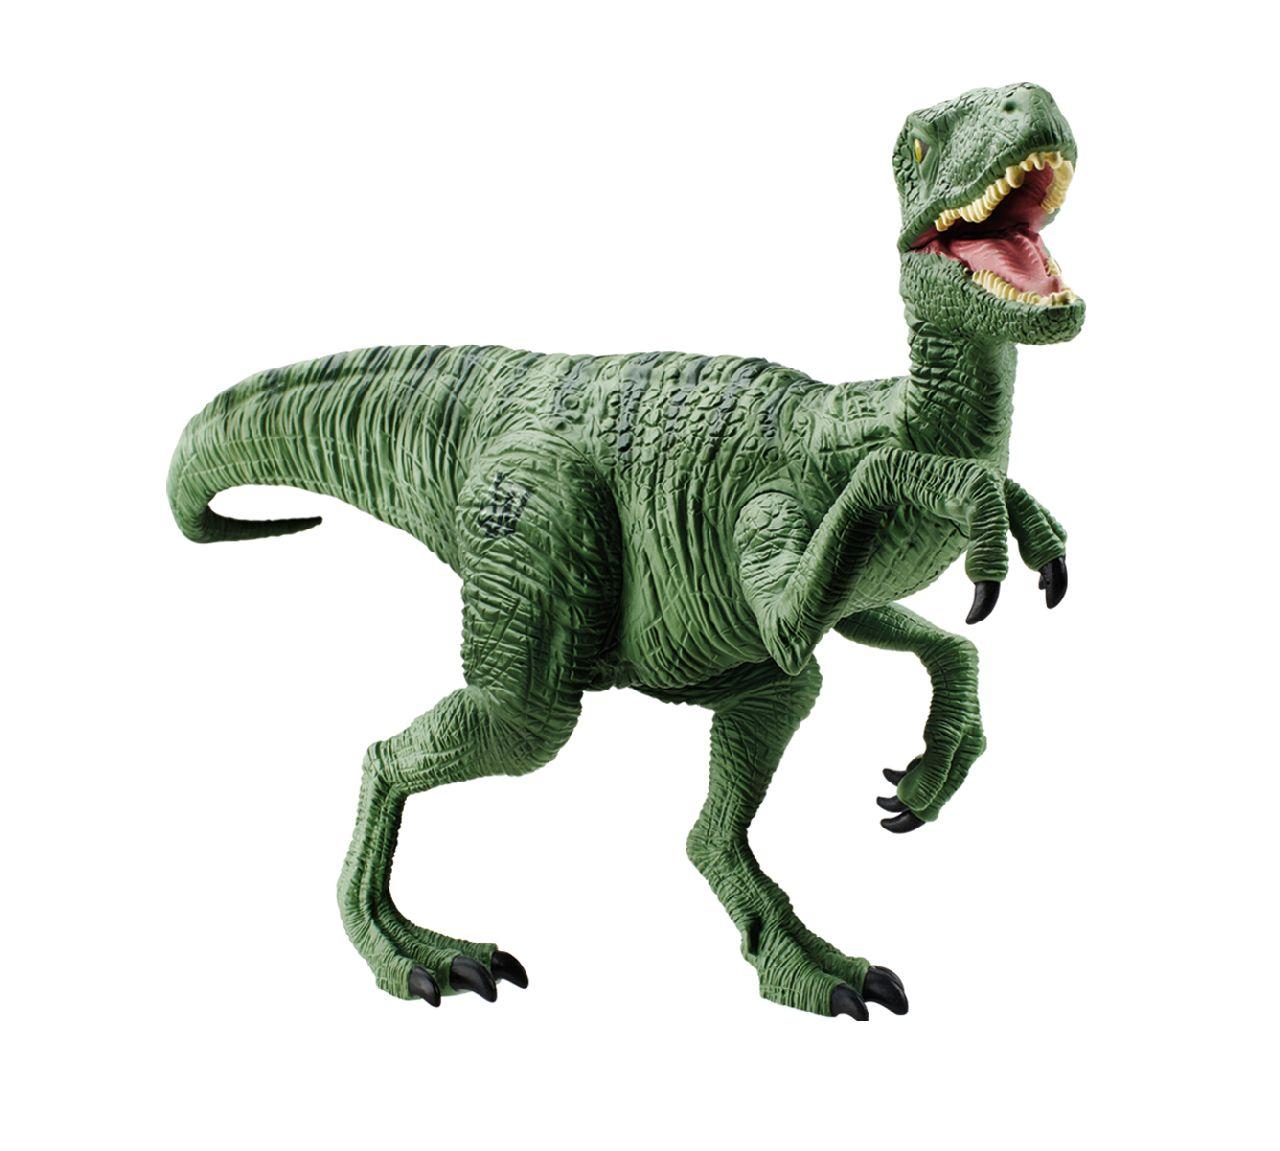 Raptor Size Insaatmcpgroupco